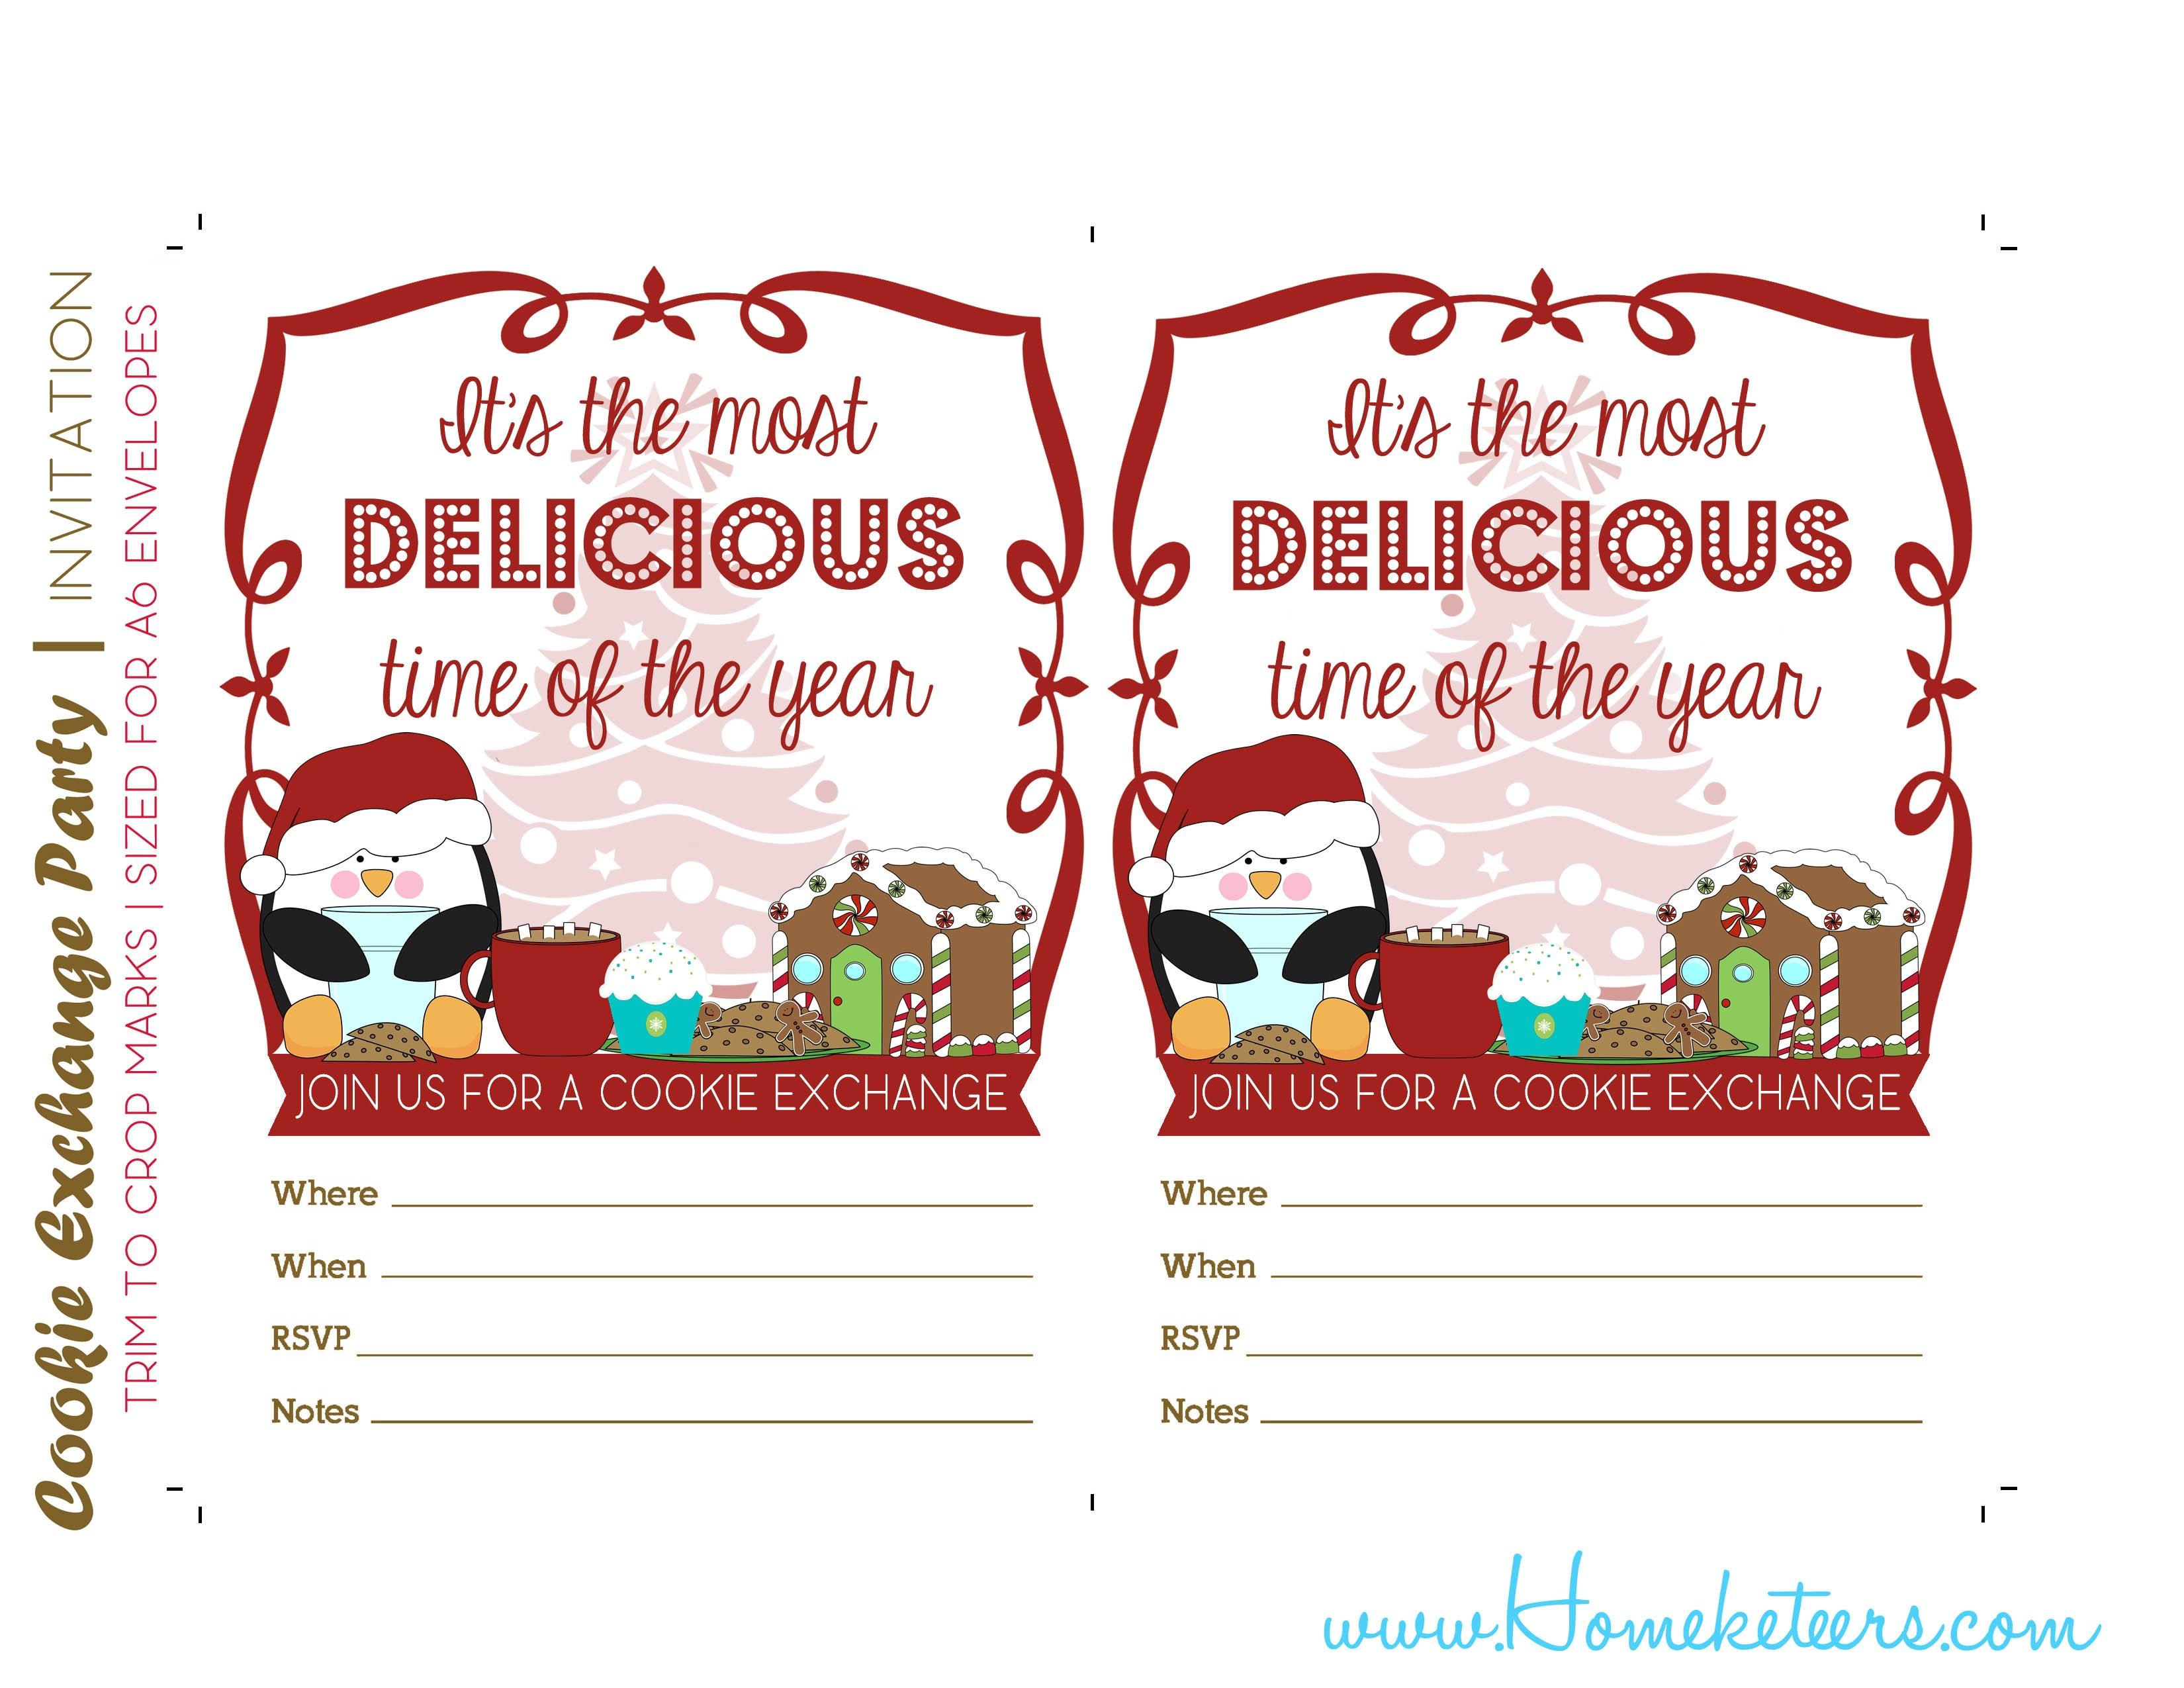 Cookie Exchange Invitation Templates New Christmas Cookie Party - Free Christmas Cookie Exchange Printable Invitation